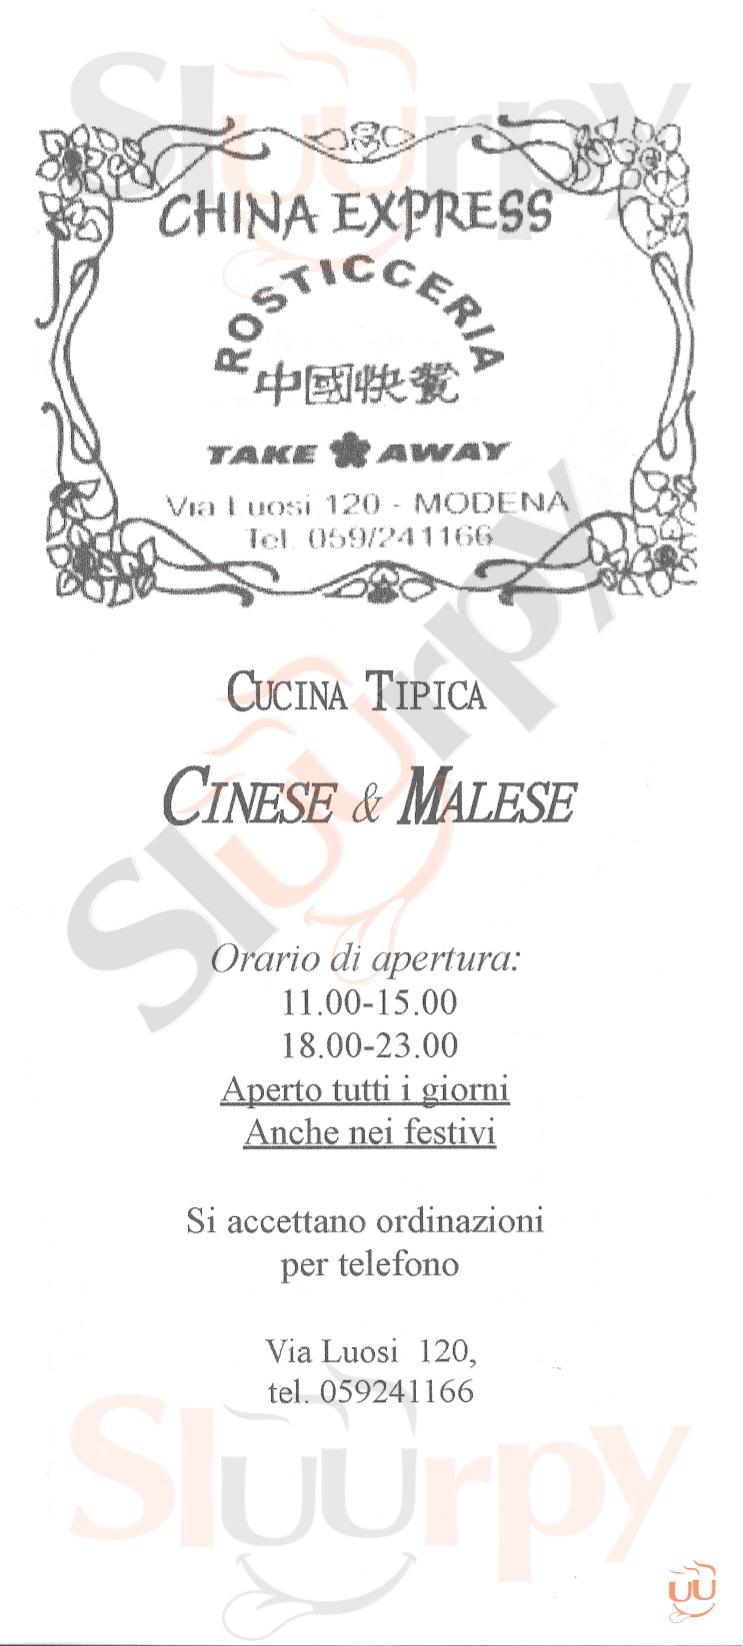 CHINA EXPRESS Modena menù 1 pagina